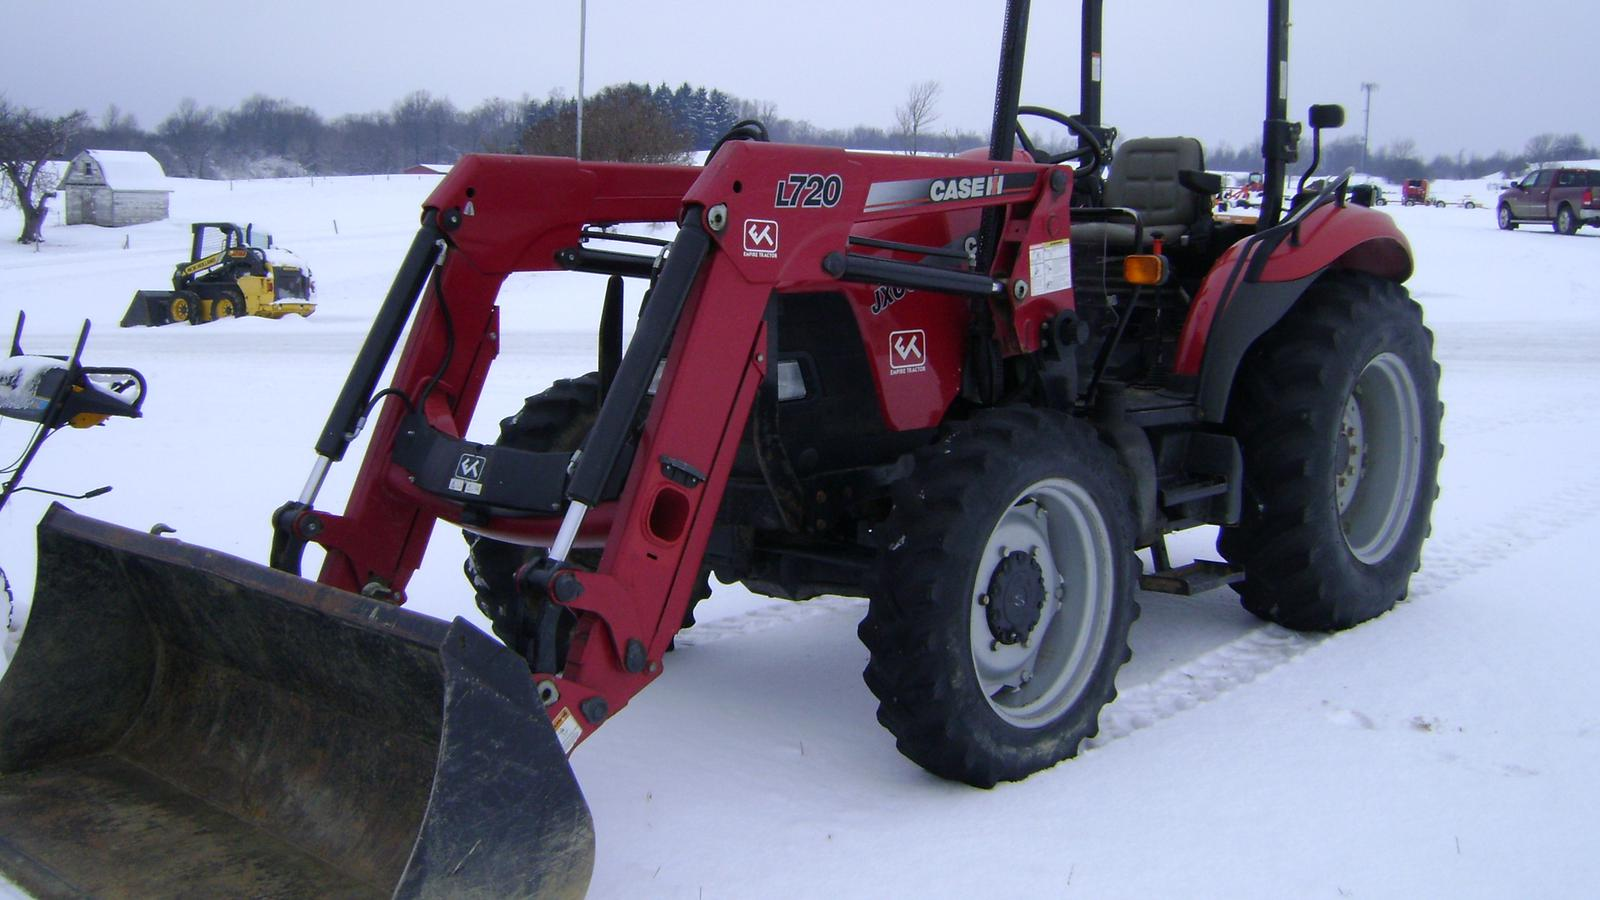 Z62600 Case IH JX60 Tractor (1) (1) case ih jx60 for sale in cazenovia, ny empire tractor, inc